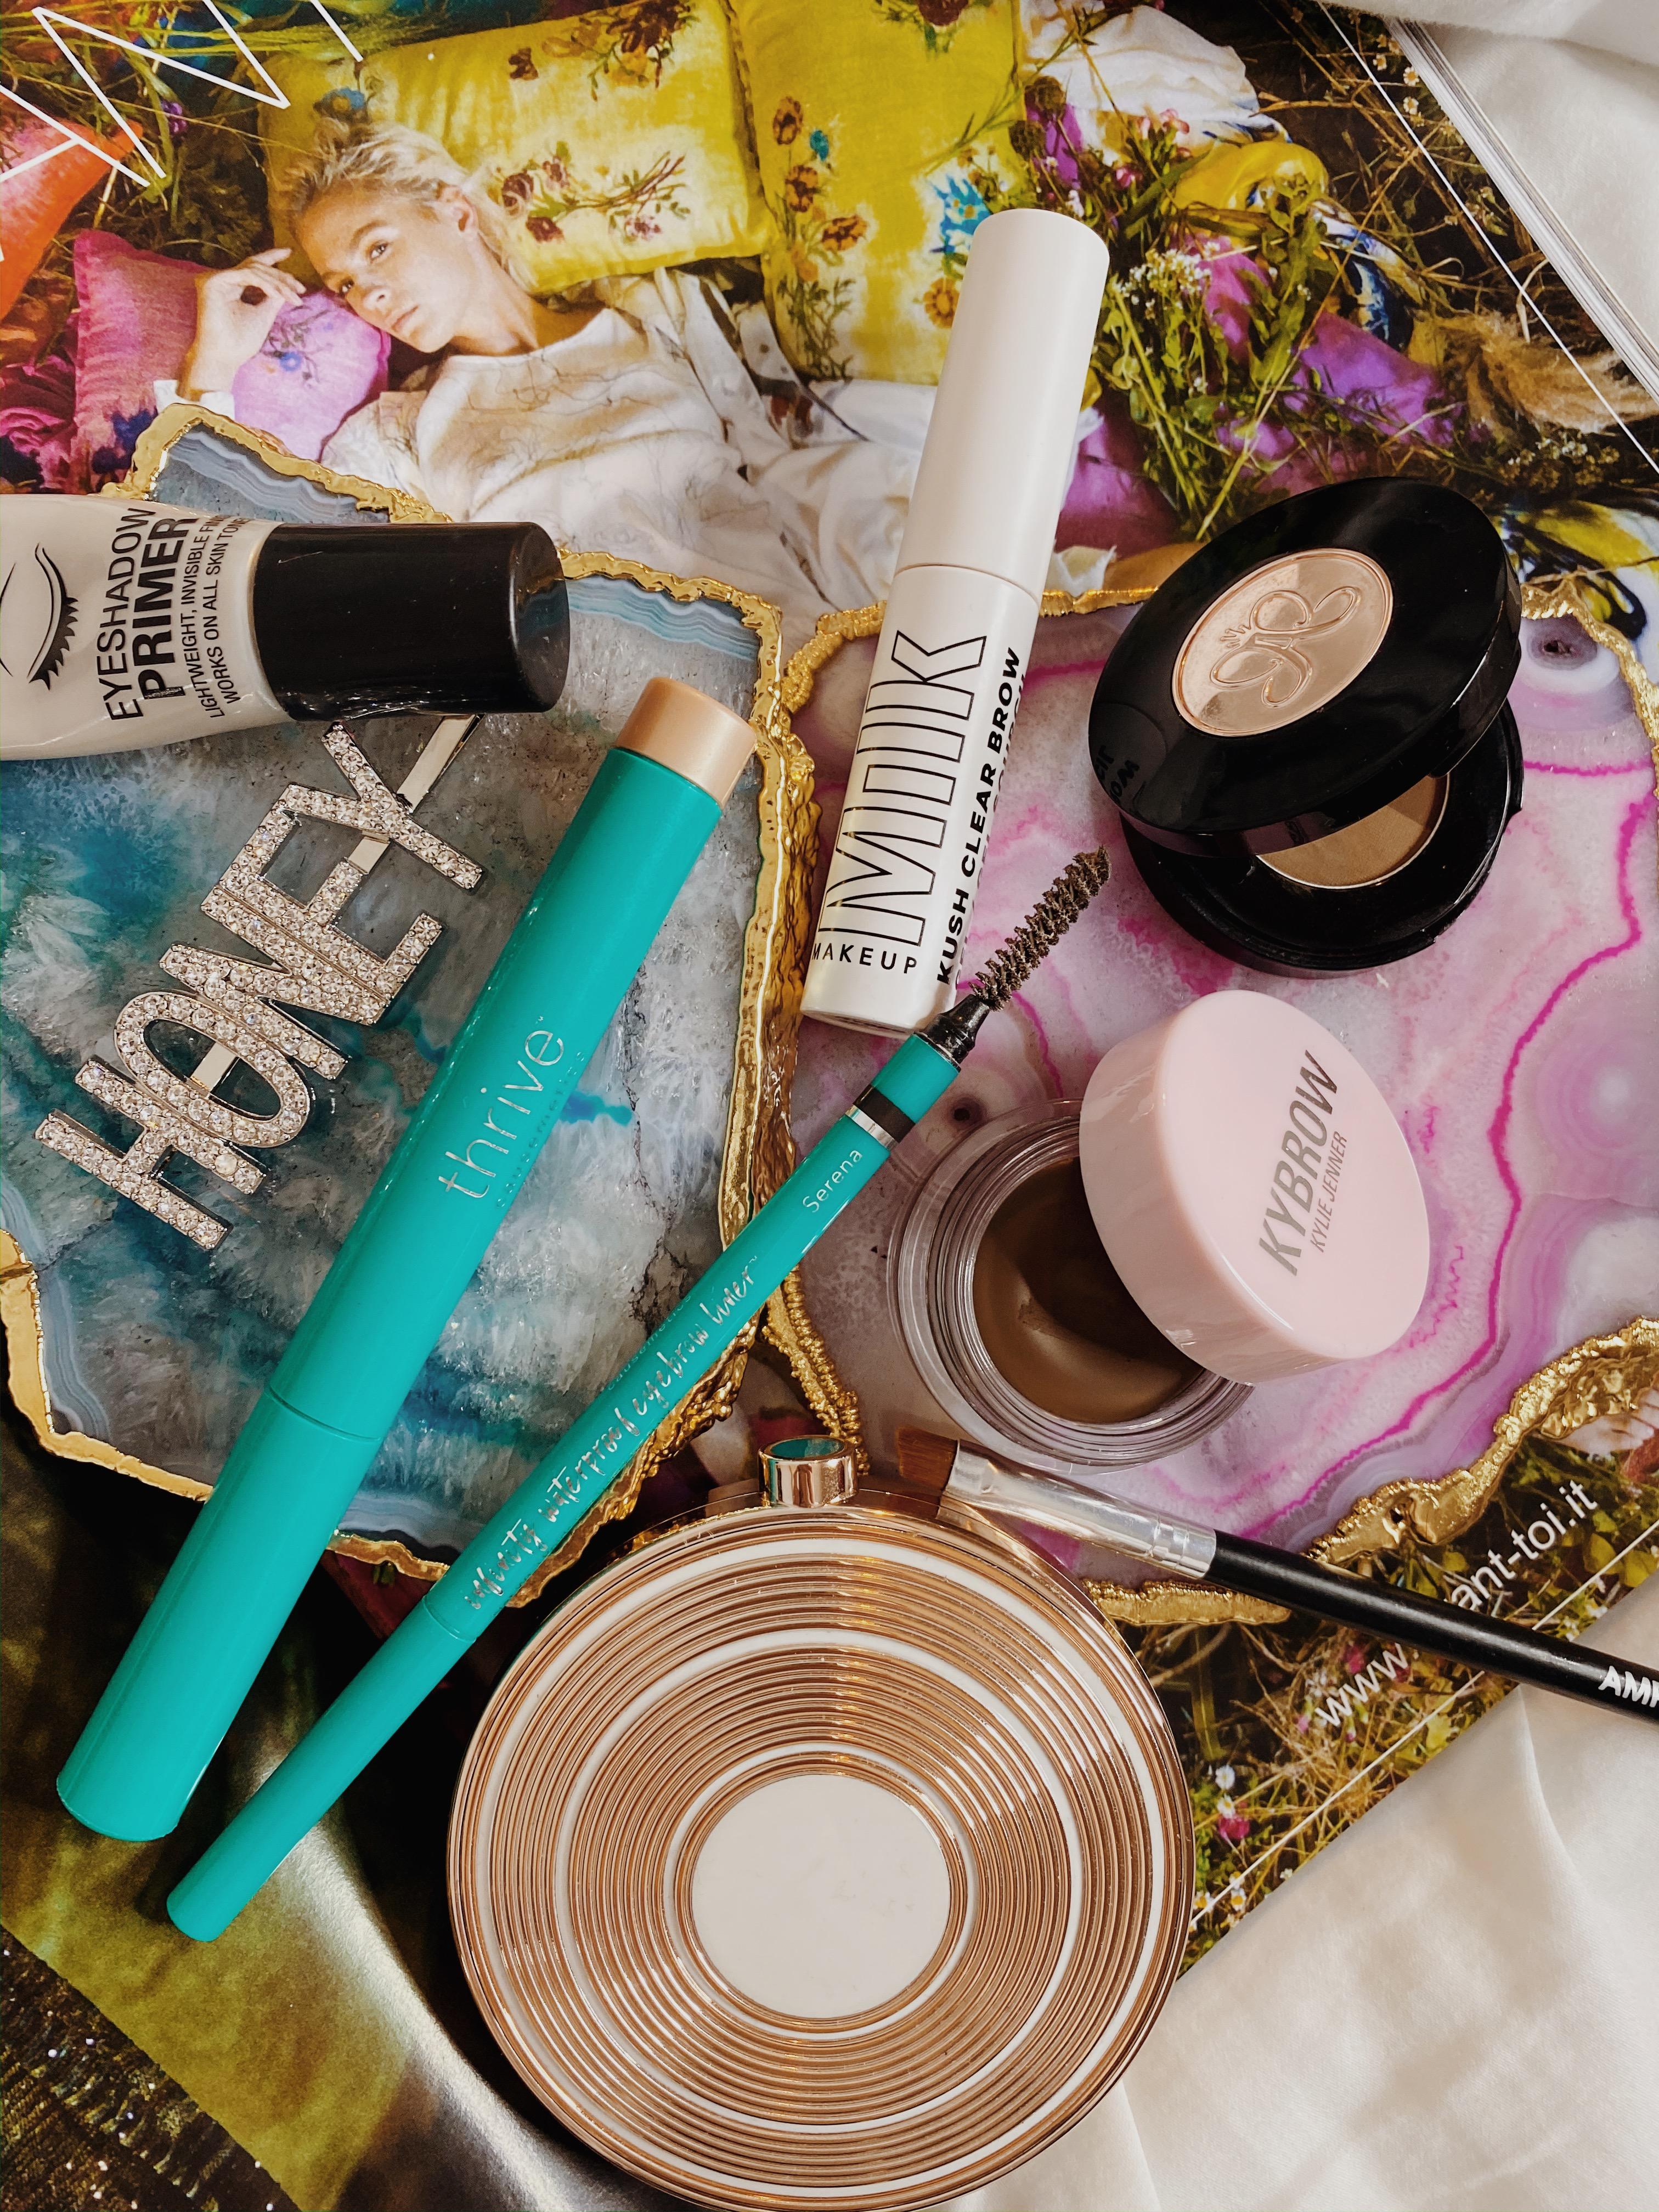 Brow Product Collection Ranking | Thrive Causmetics Brow Liner | Milk Makeup Kush Clear Brow Gel | Anastasia Beverly Hills Brow Powder | Kybrow Pomade